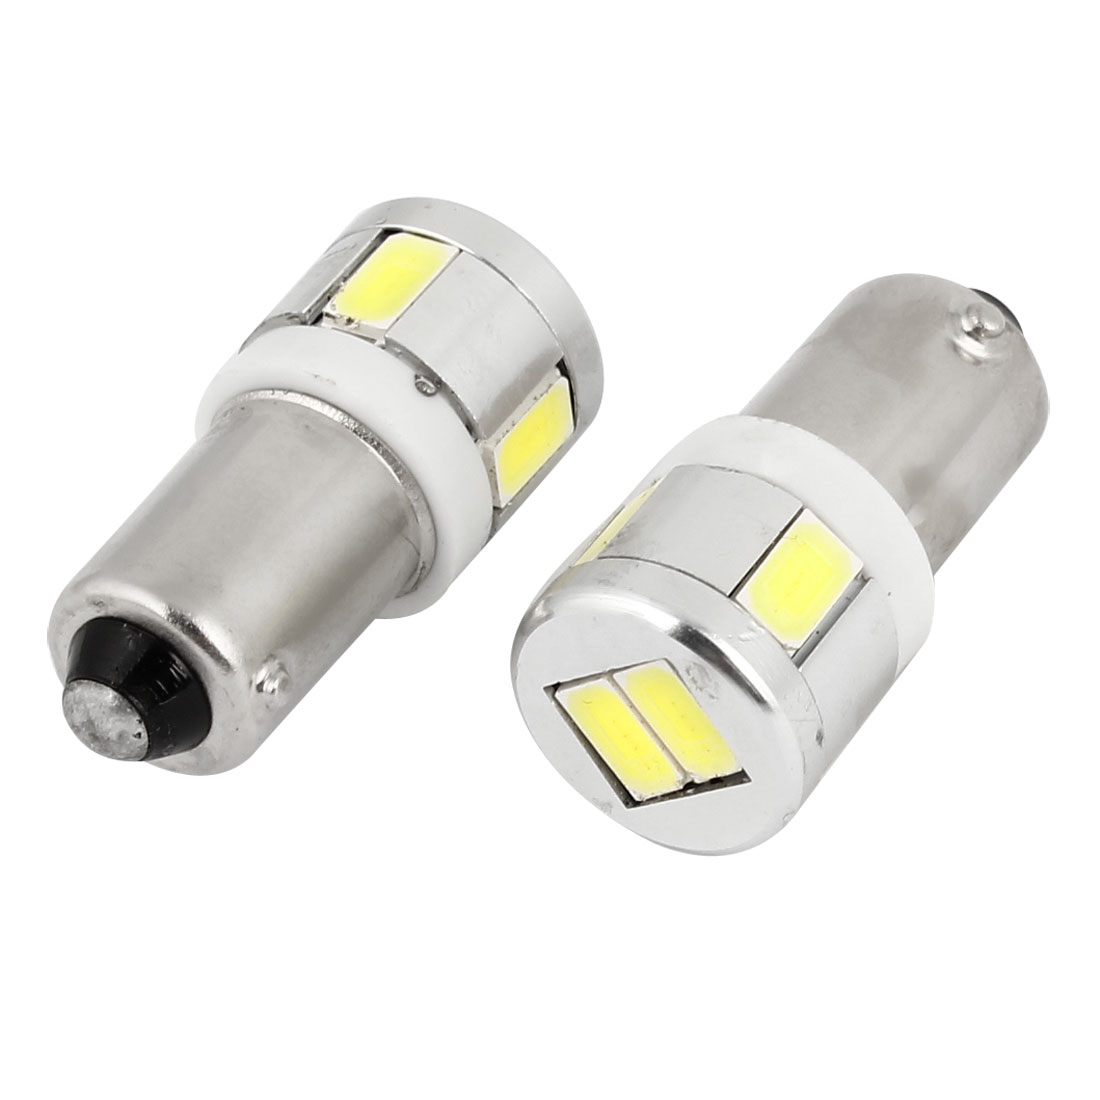 BA9S T4W Base White 5730 SMD 6 LED Car Dashboard Side Light Lamp Bulb 2 Pcs